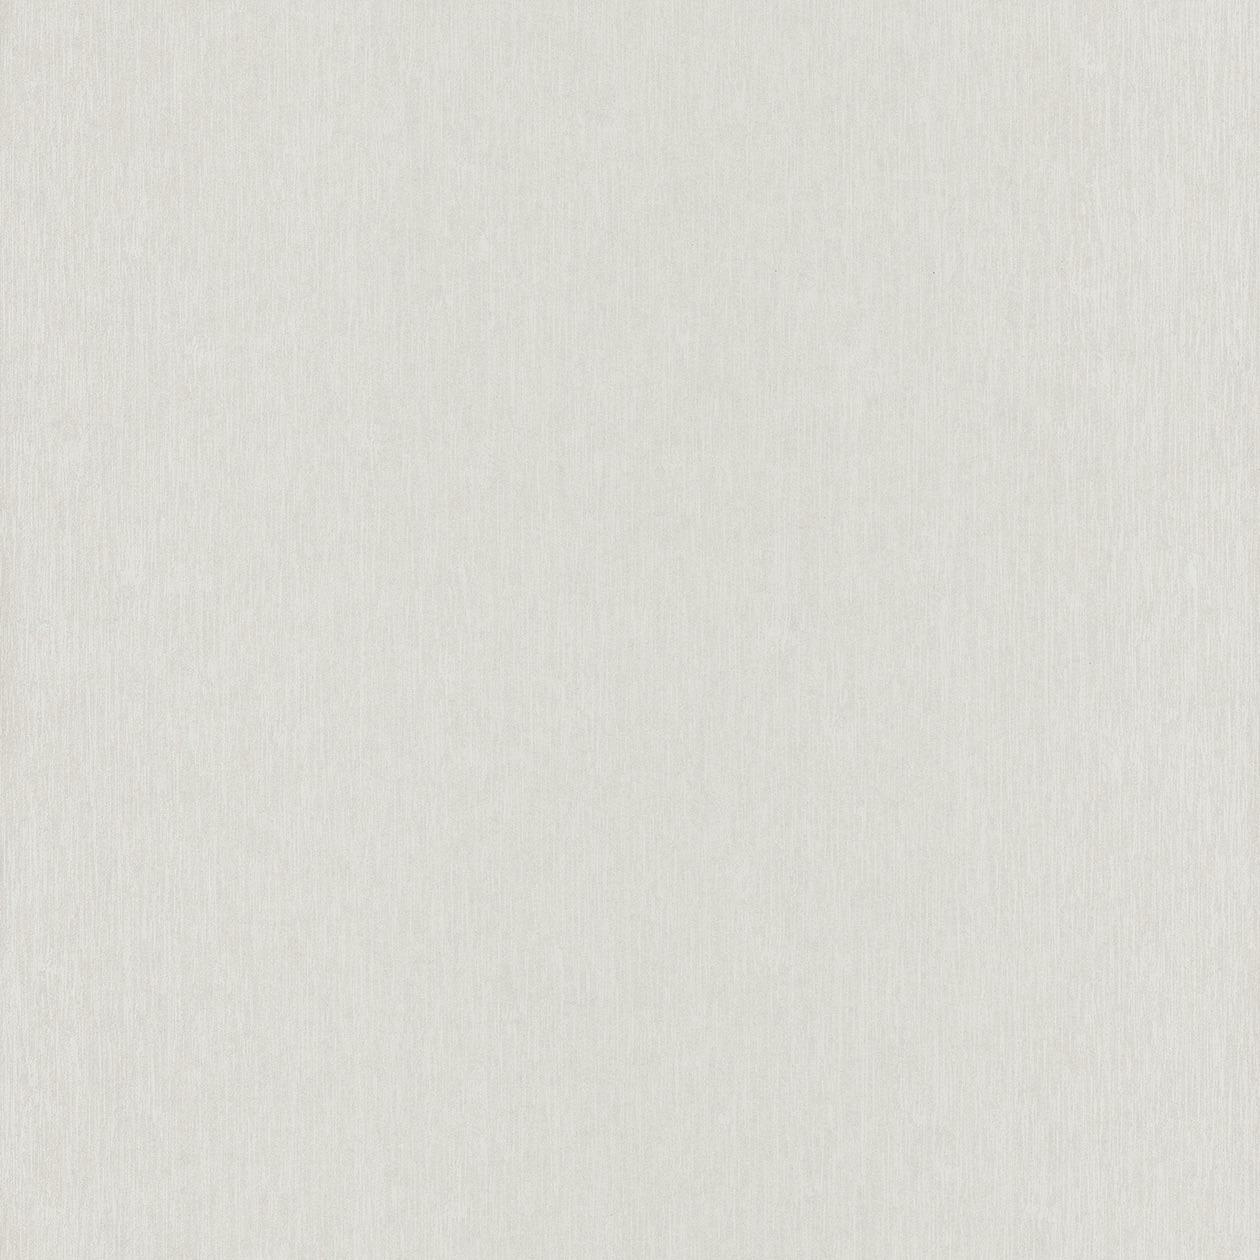 Французские обои Caselio,  коллекция Trio, артикулTIO62930000